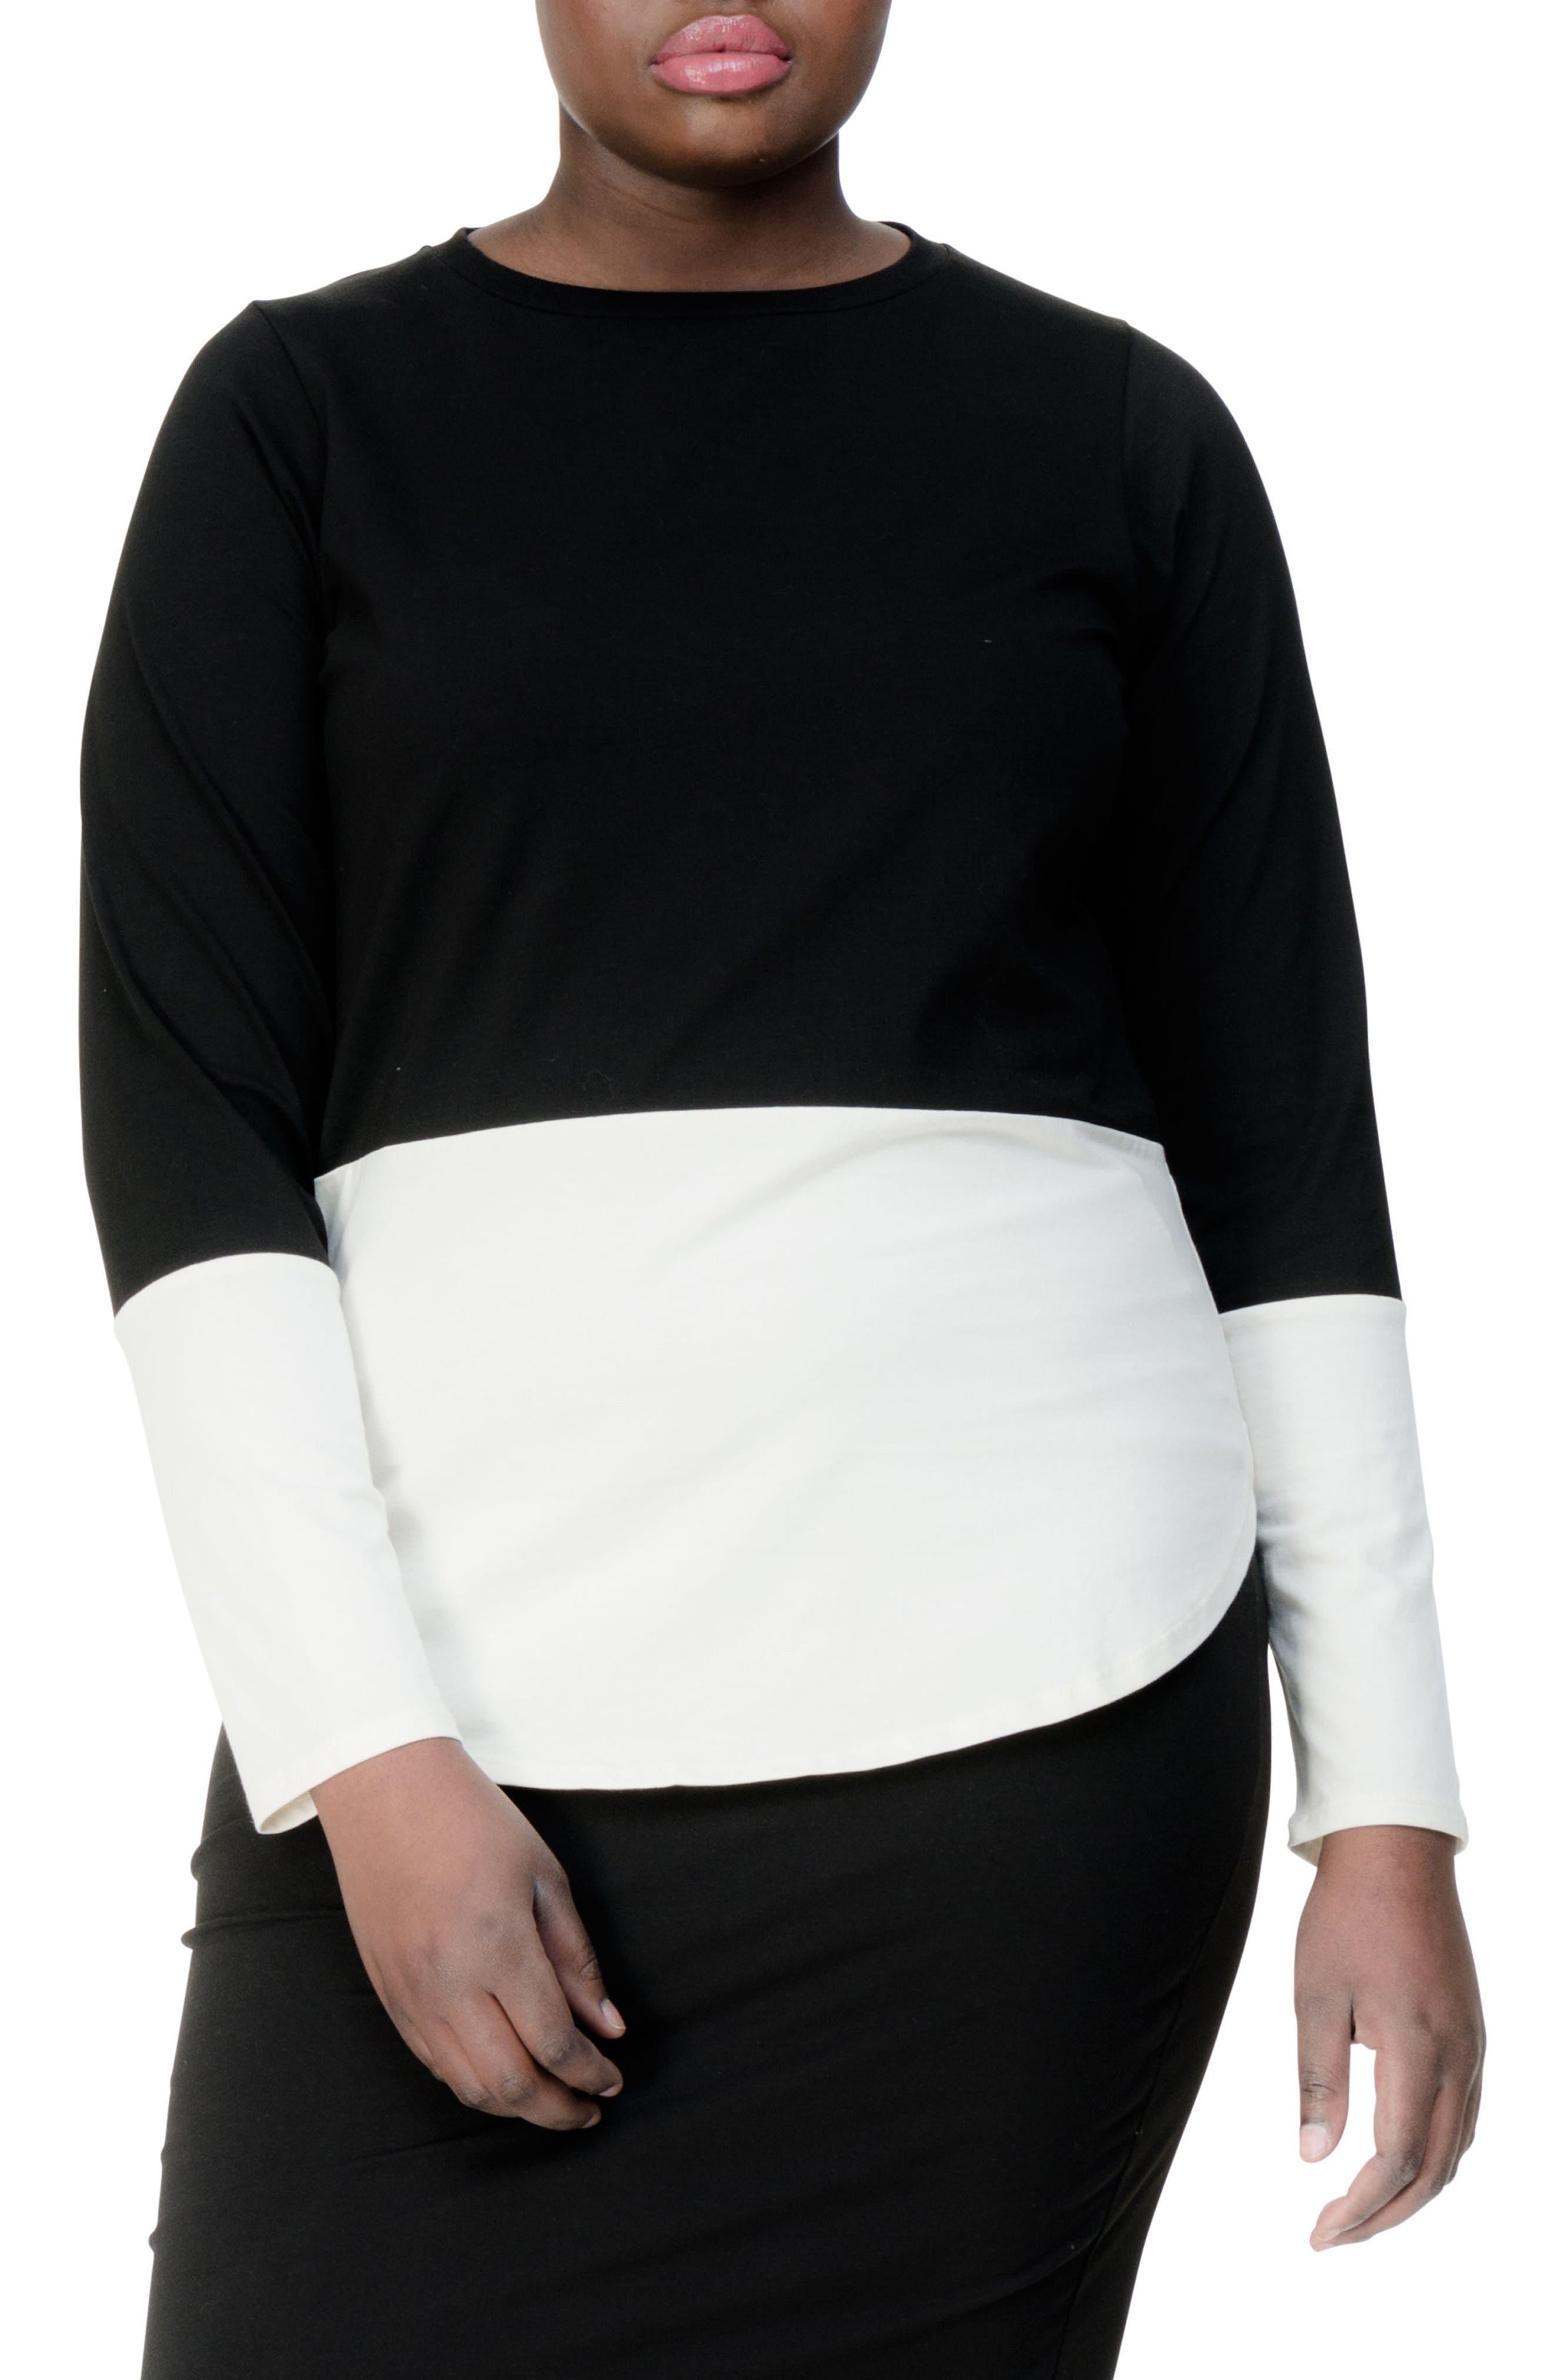 Rhine Colorblock Top,                         Main,                         color, BLACK/ WHITE